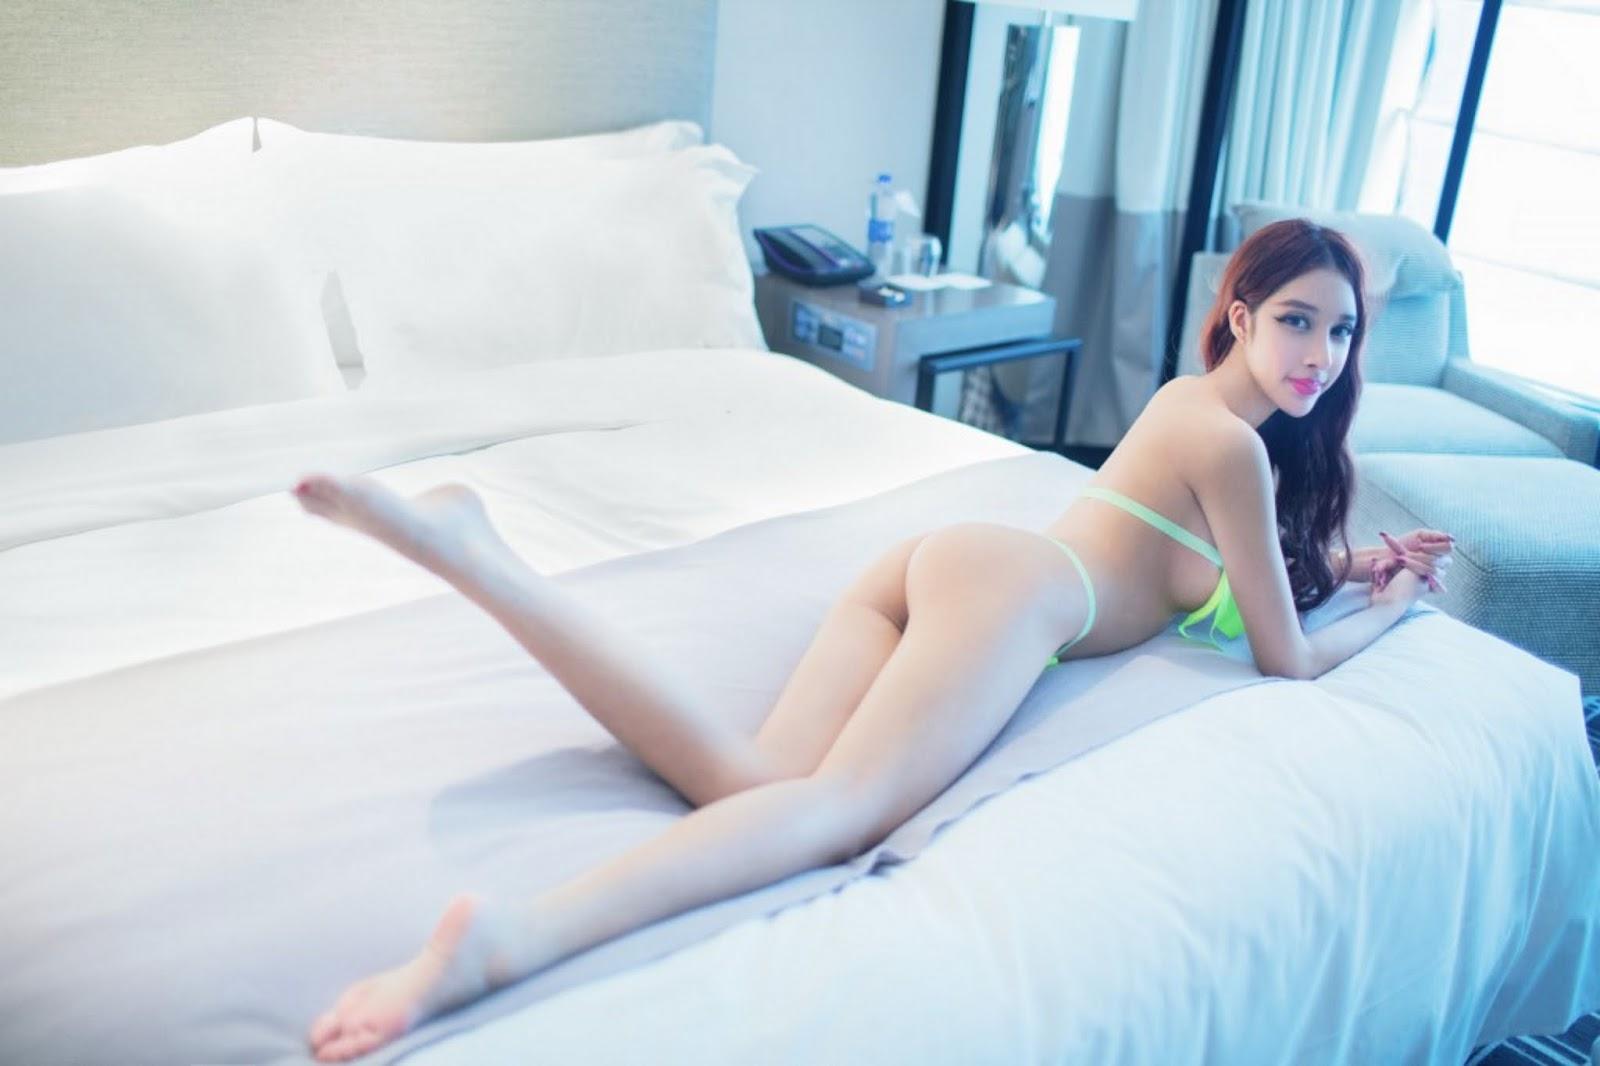 %25C2%25B1 %25C2%25B1 32 - Model Nude TUIGIRL NO.49 Beauty Body Tits